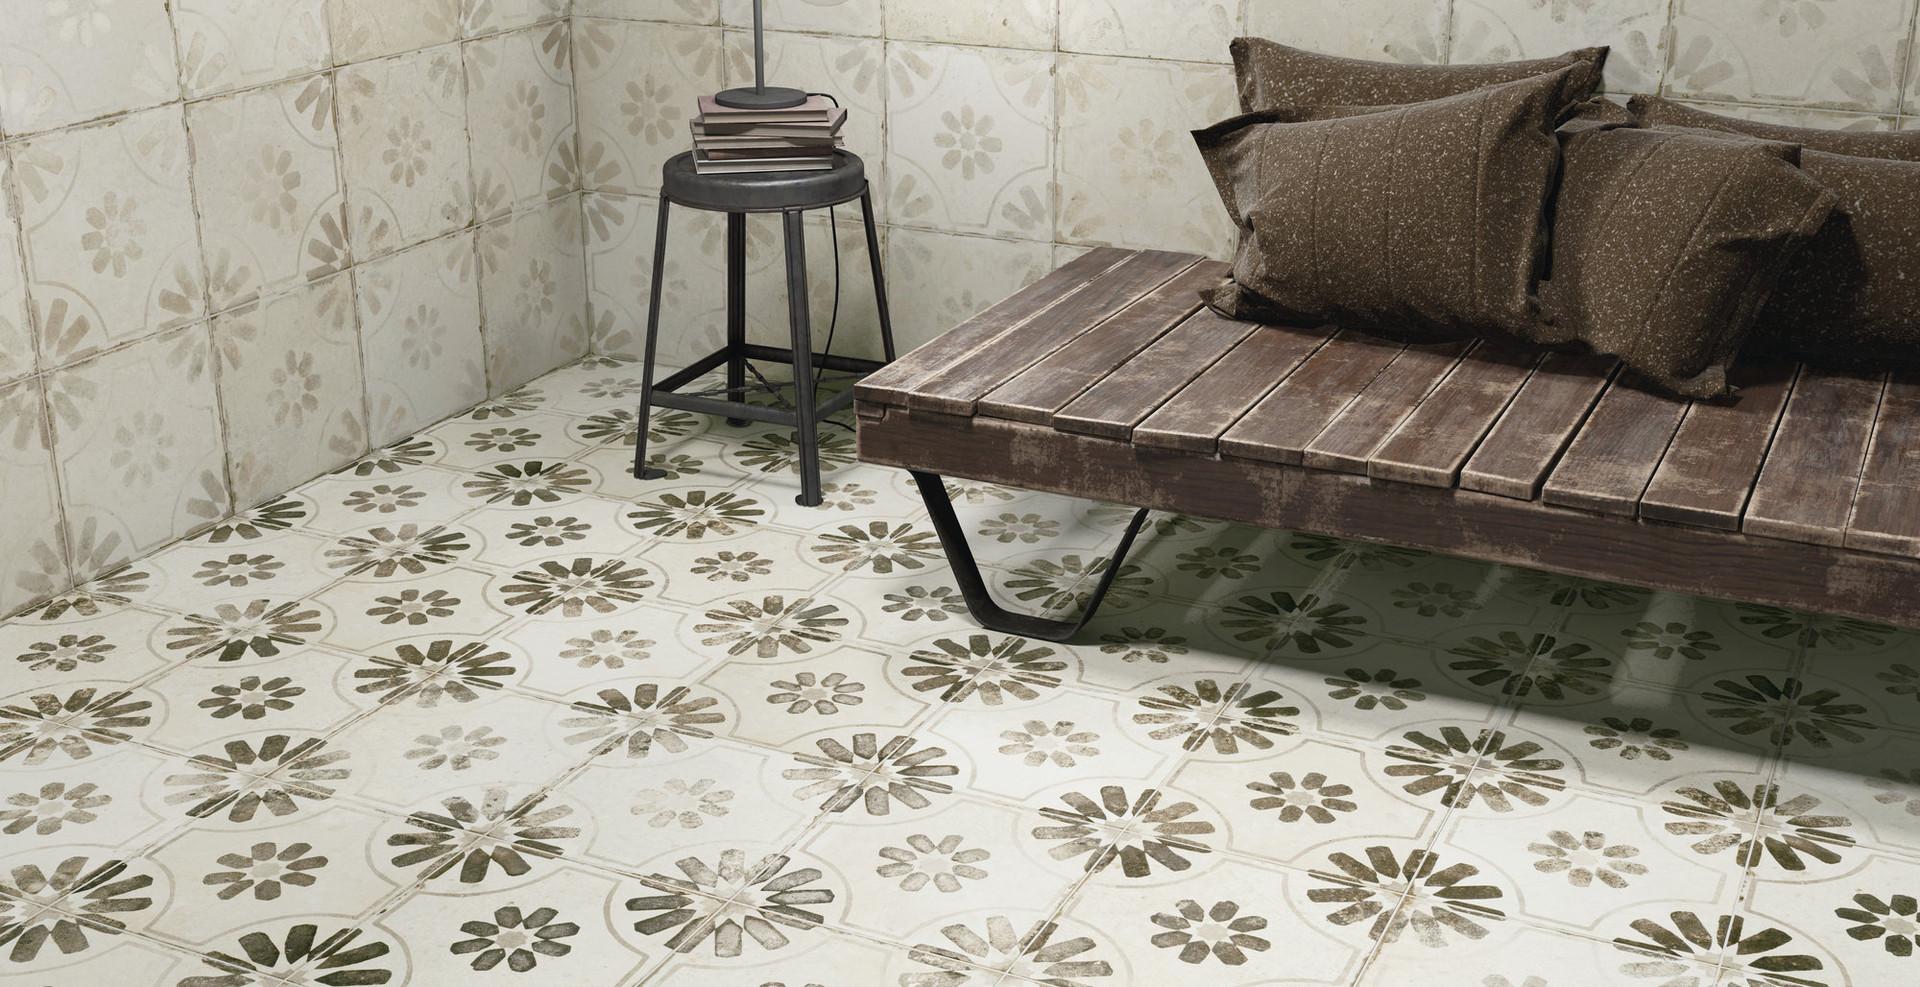 FS Blume Encaustic Tiles